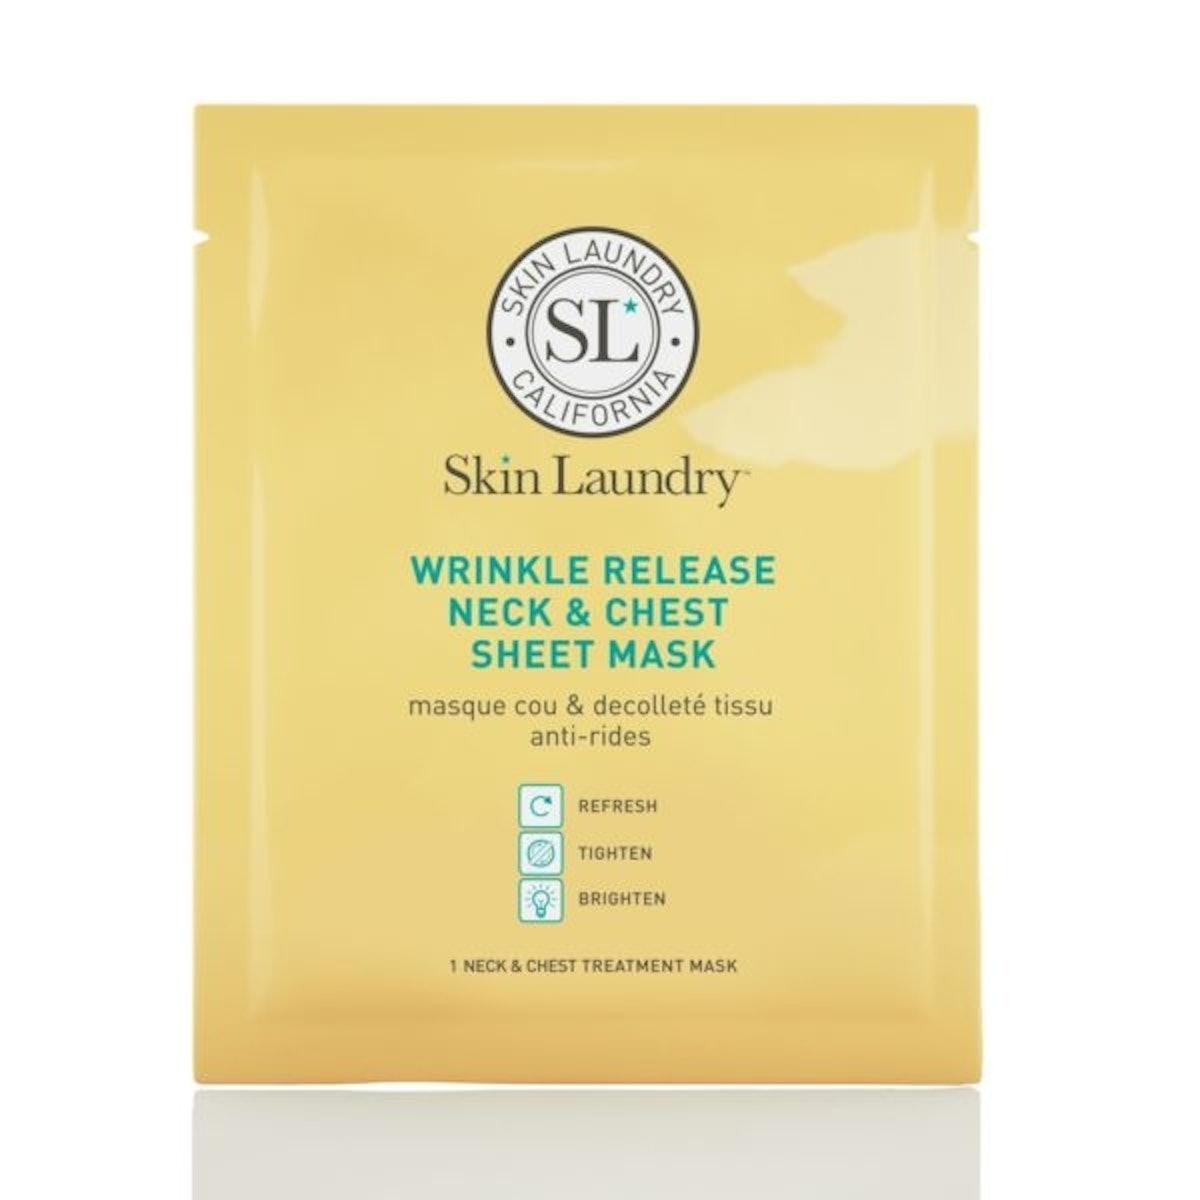 Wrinkle Release Neck & Chest Sheet Mask